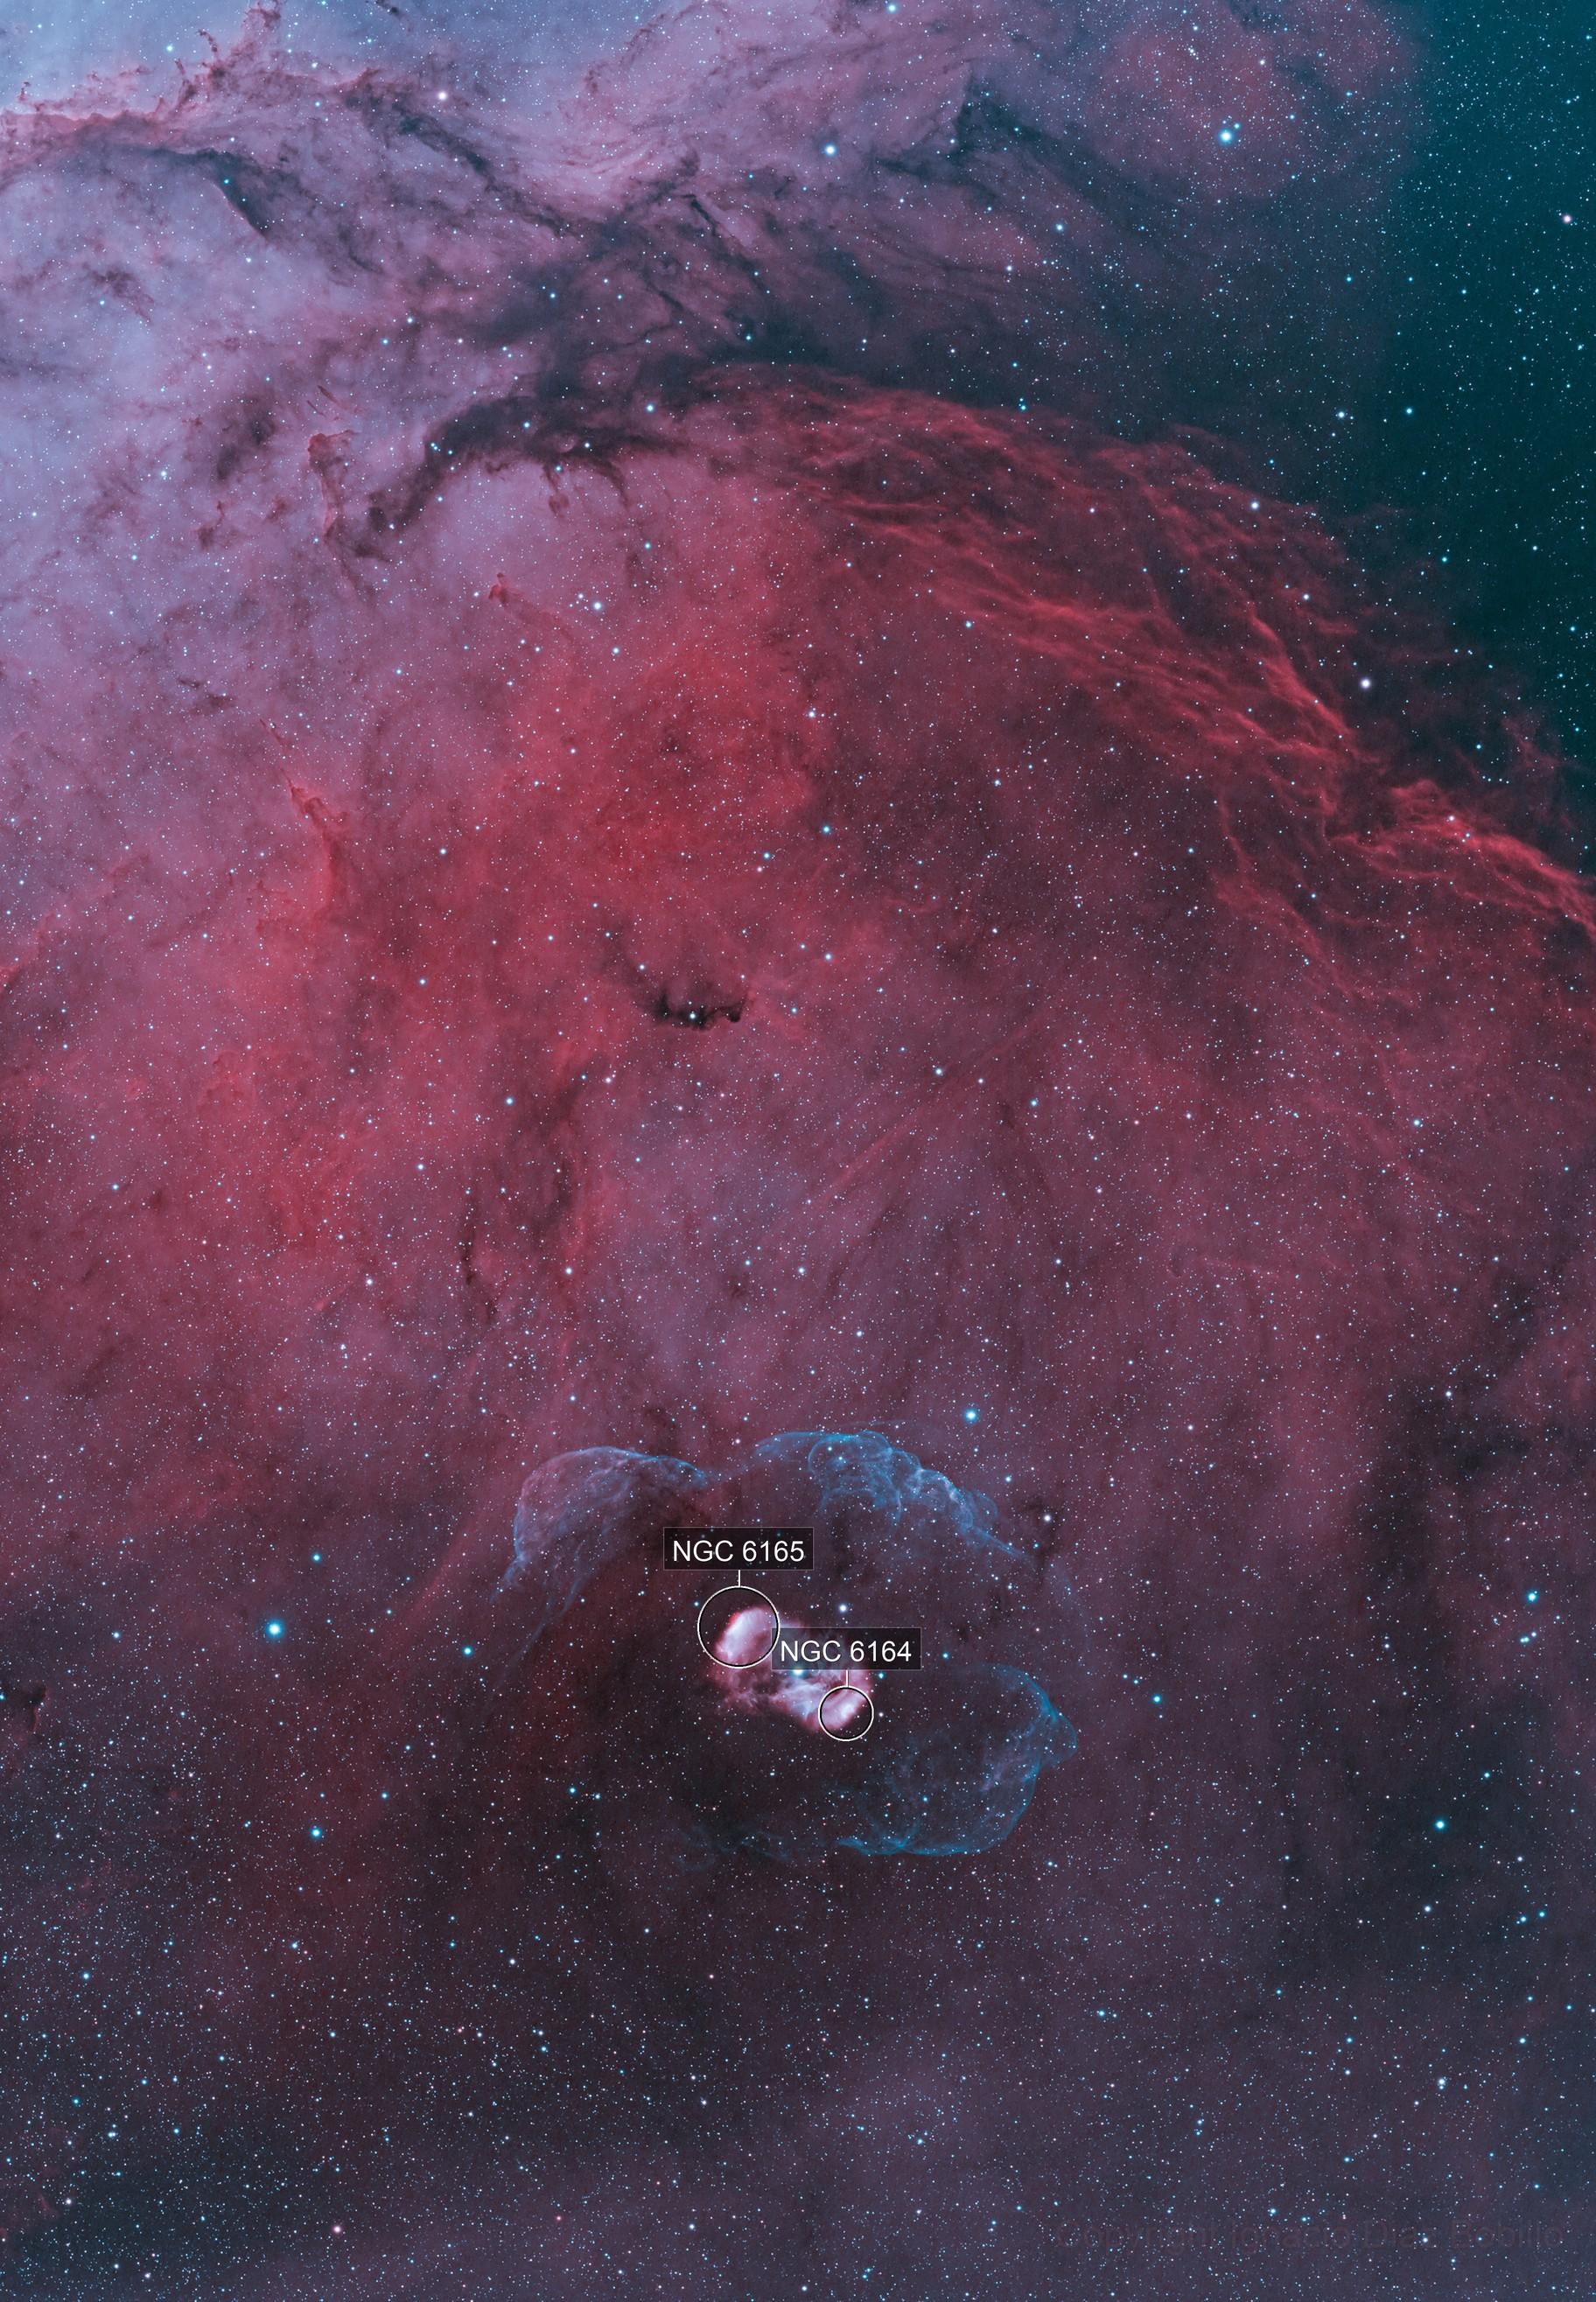 NGC 6164 and Surroundings